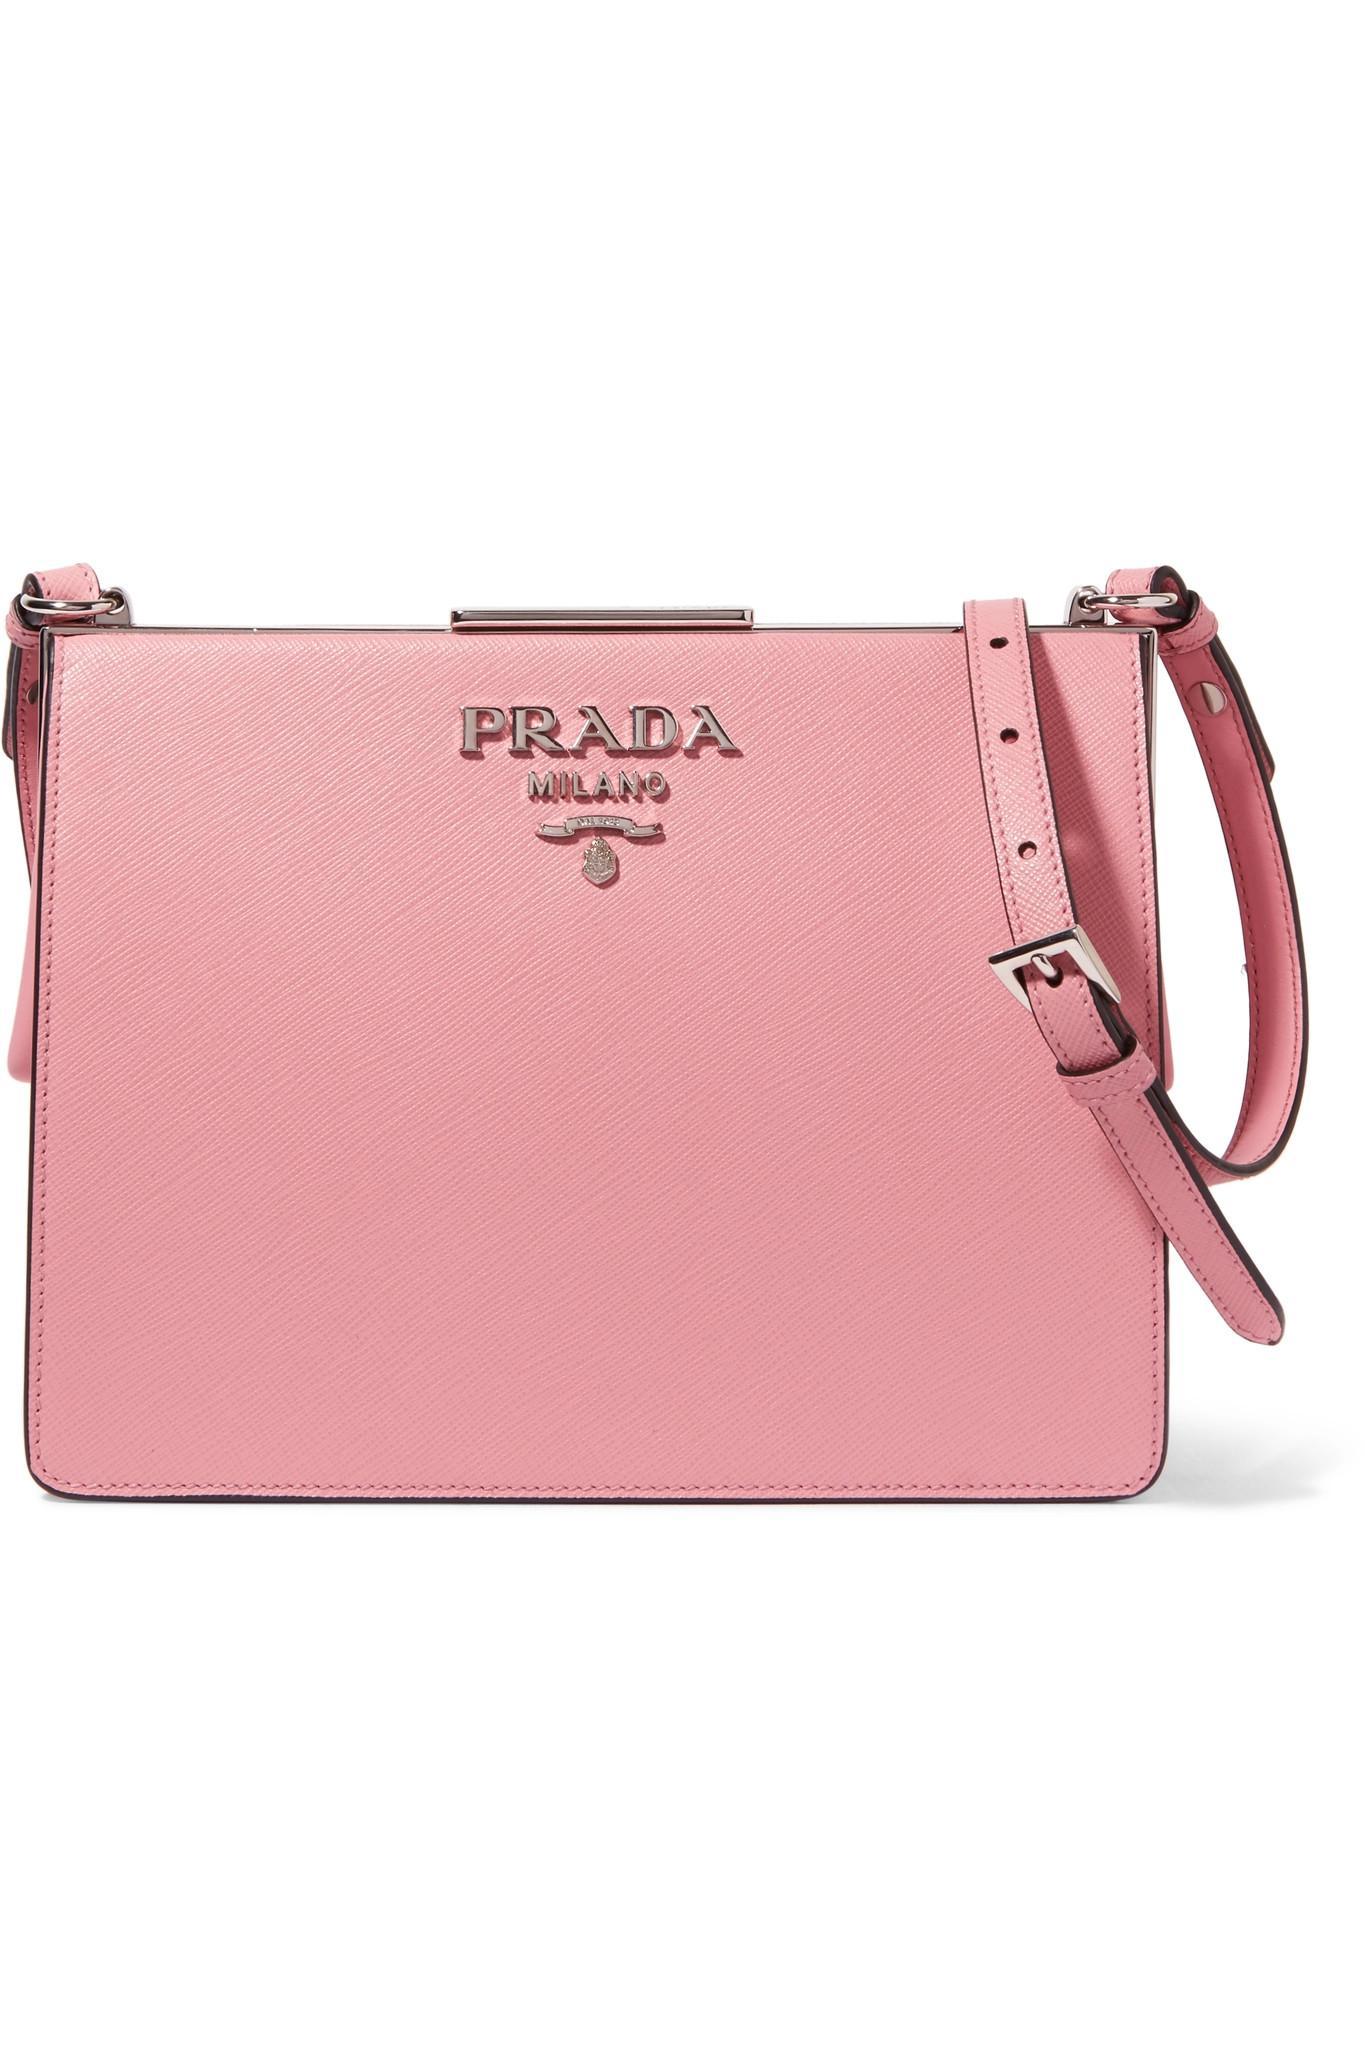 349351f3a5 Prada Frame Textured-leather Shoulder Bag in Pink - Lyst